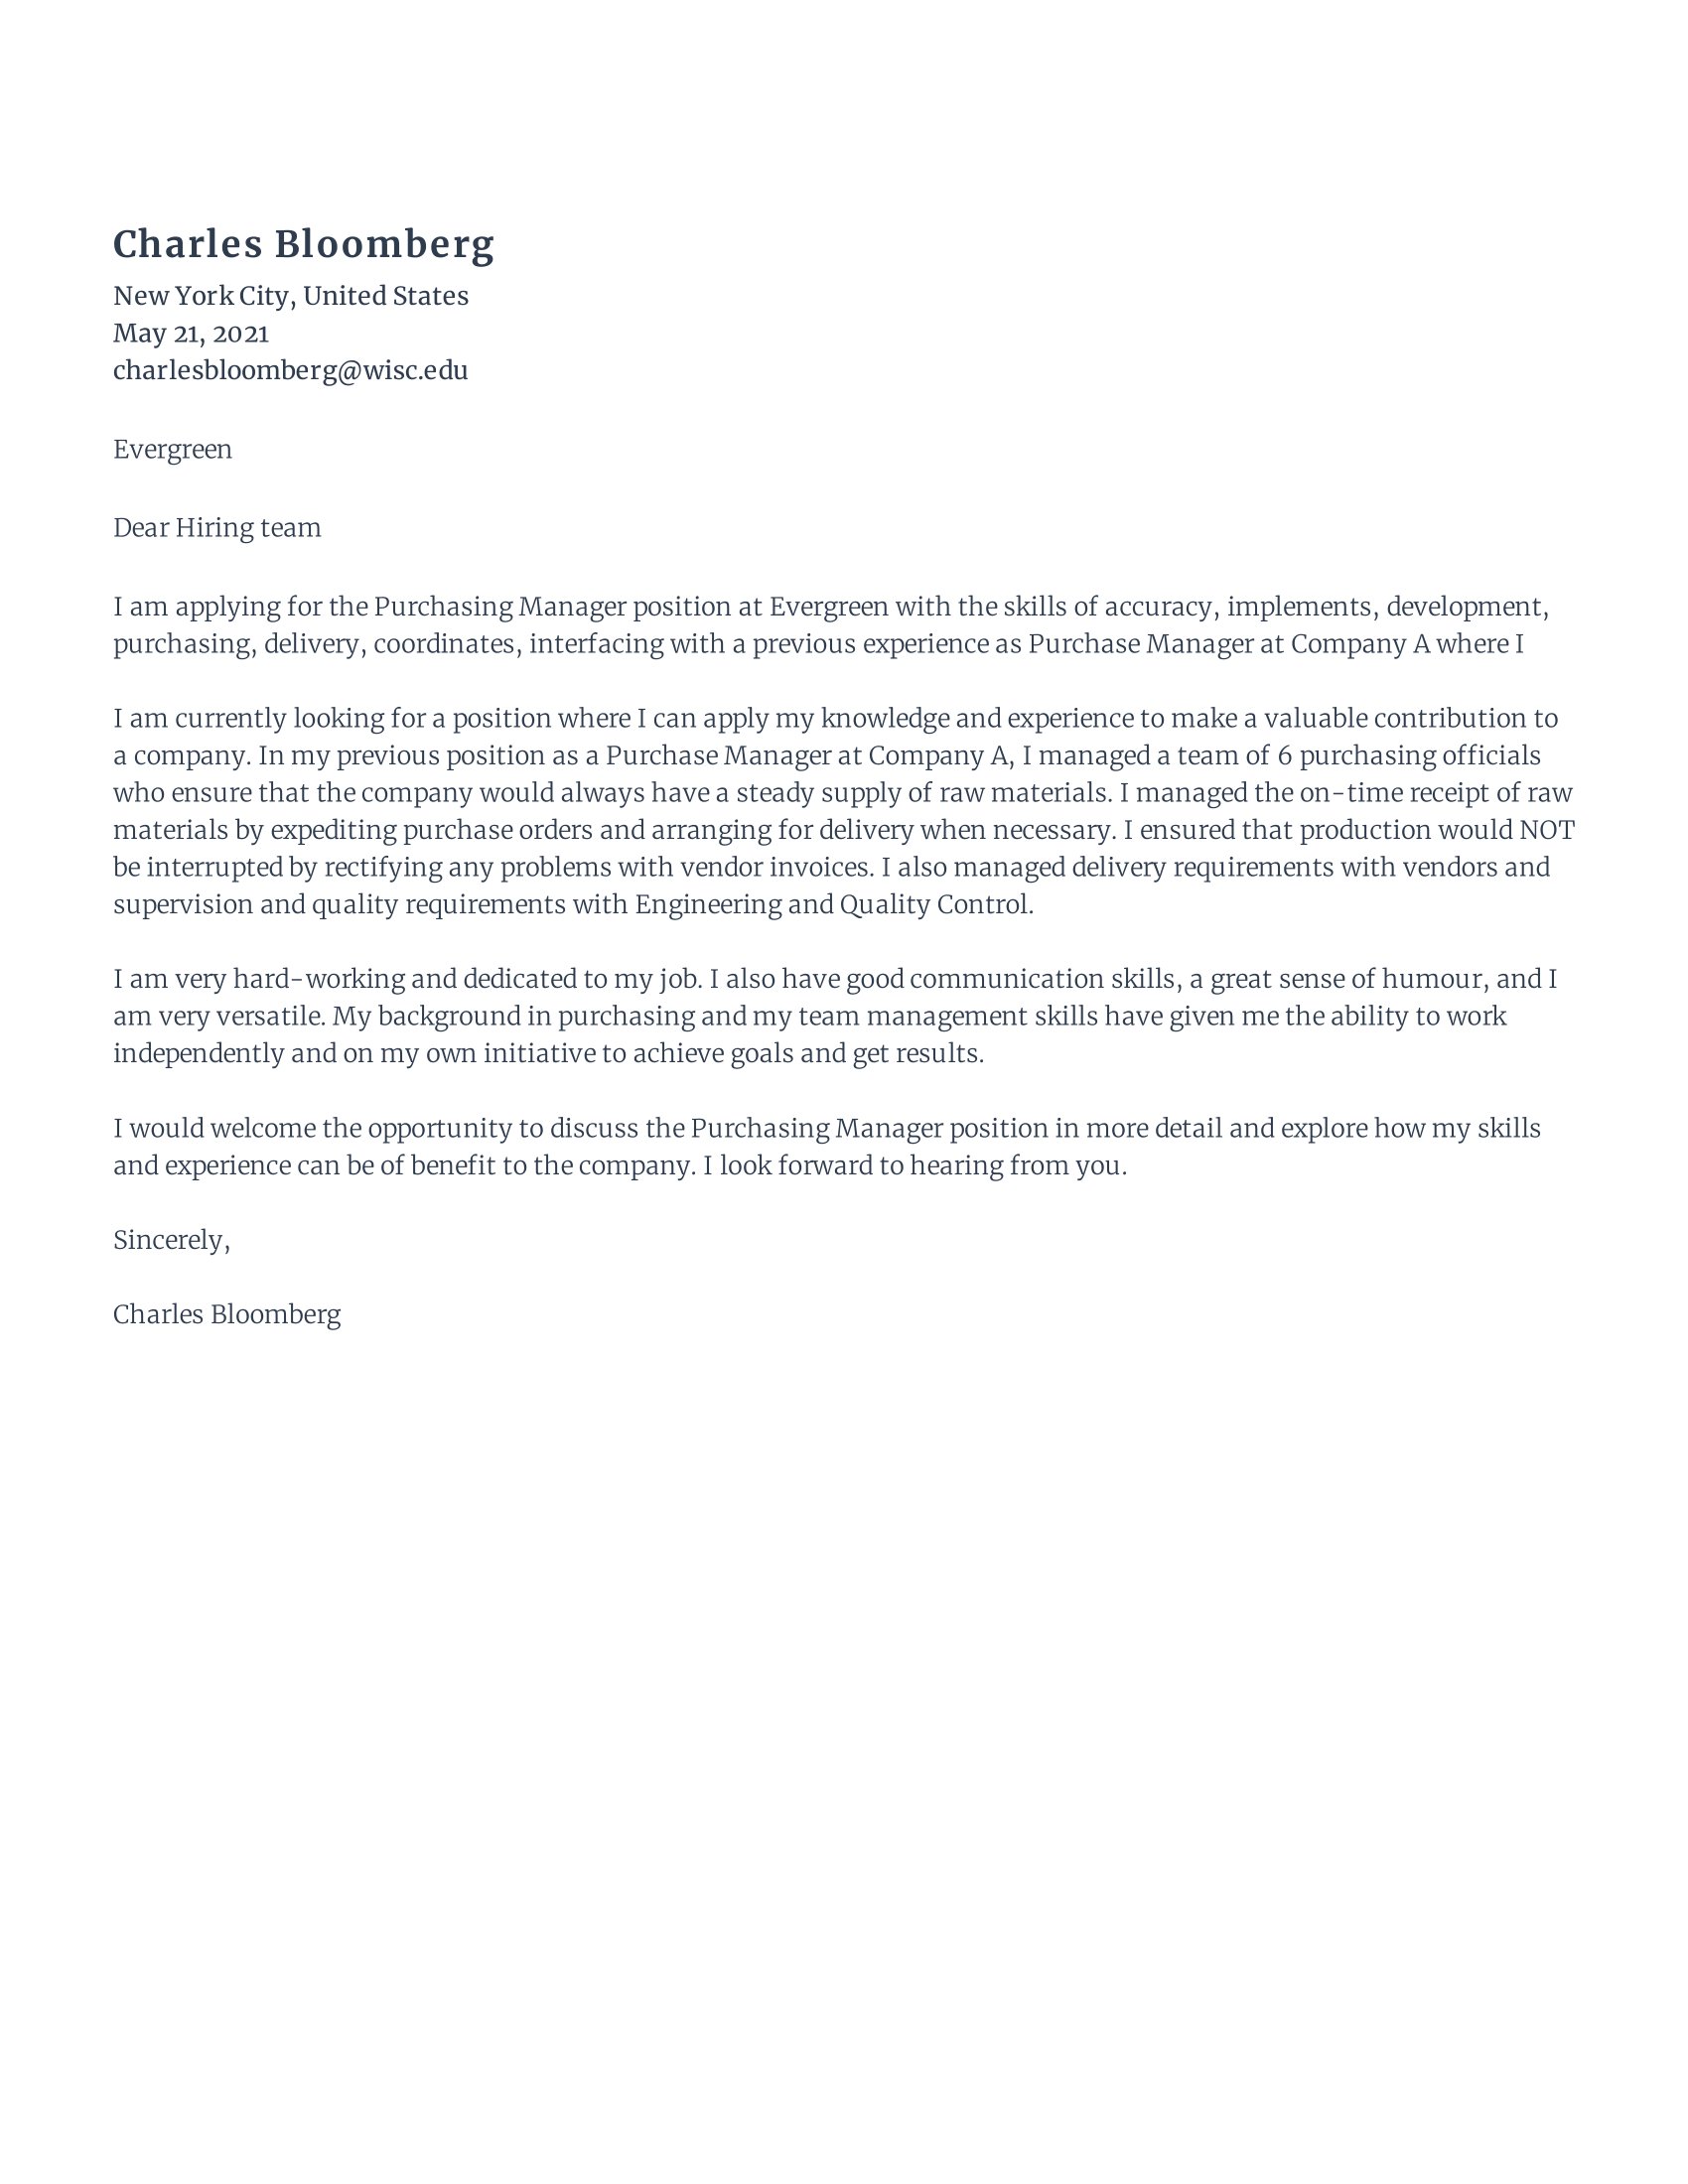 Procurement Manager Cover Letter